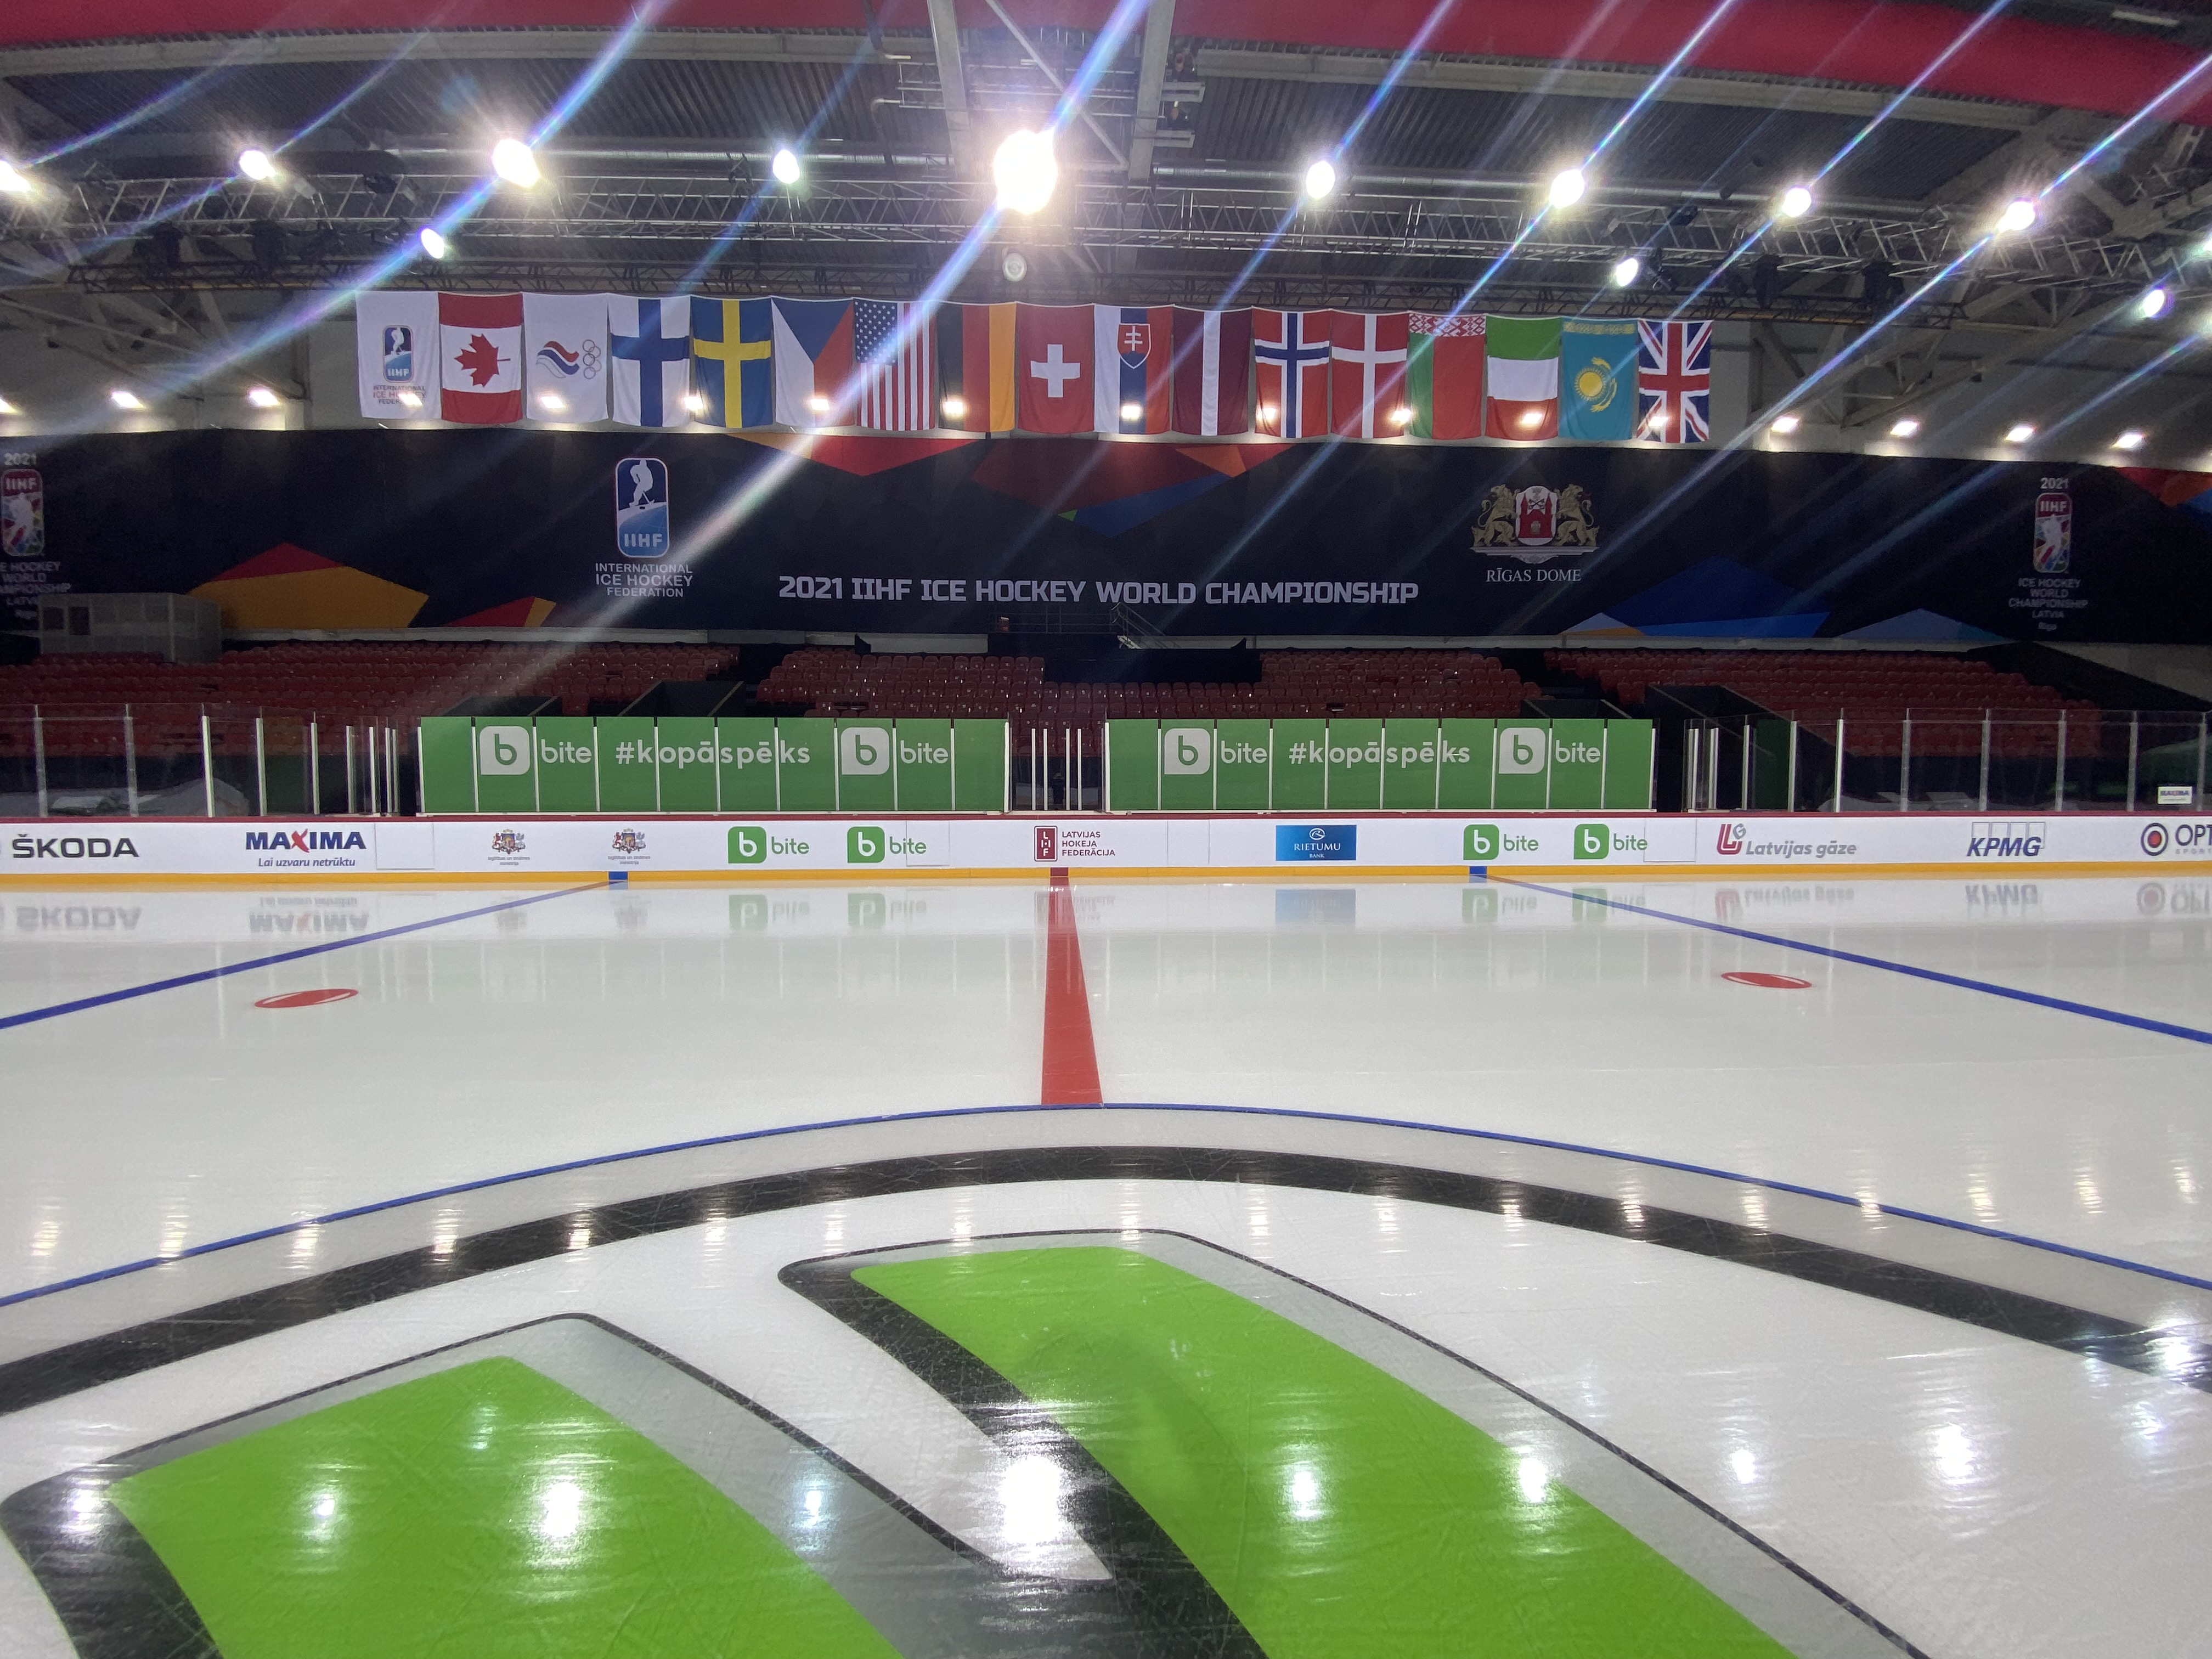 Elektrum olympic center - unisport